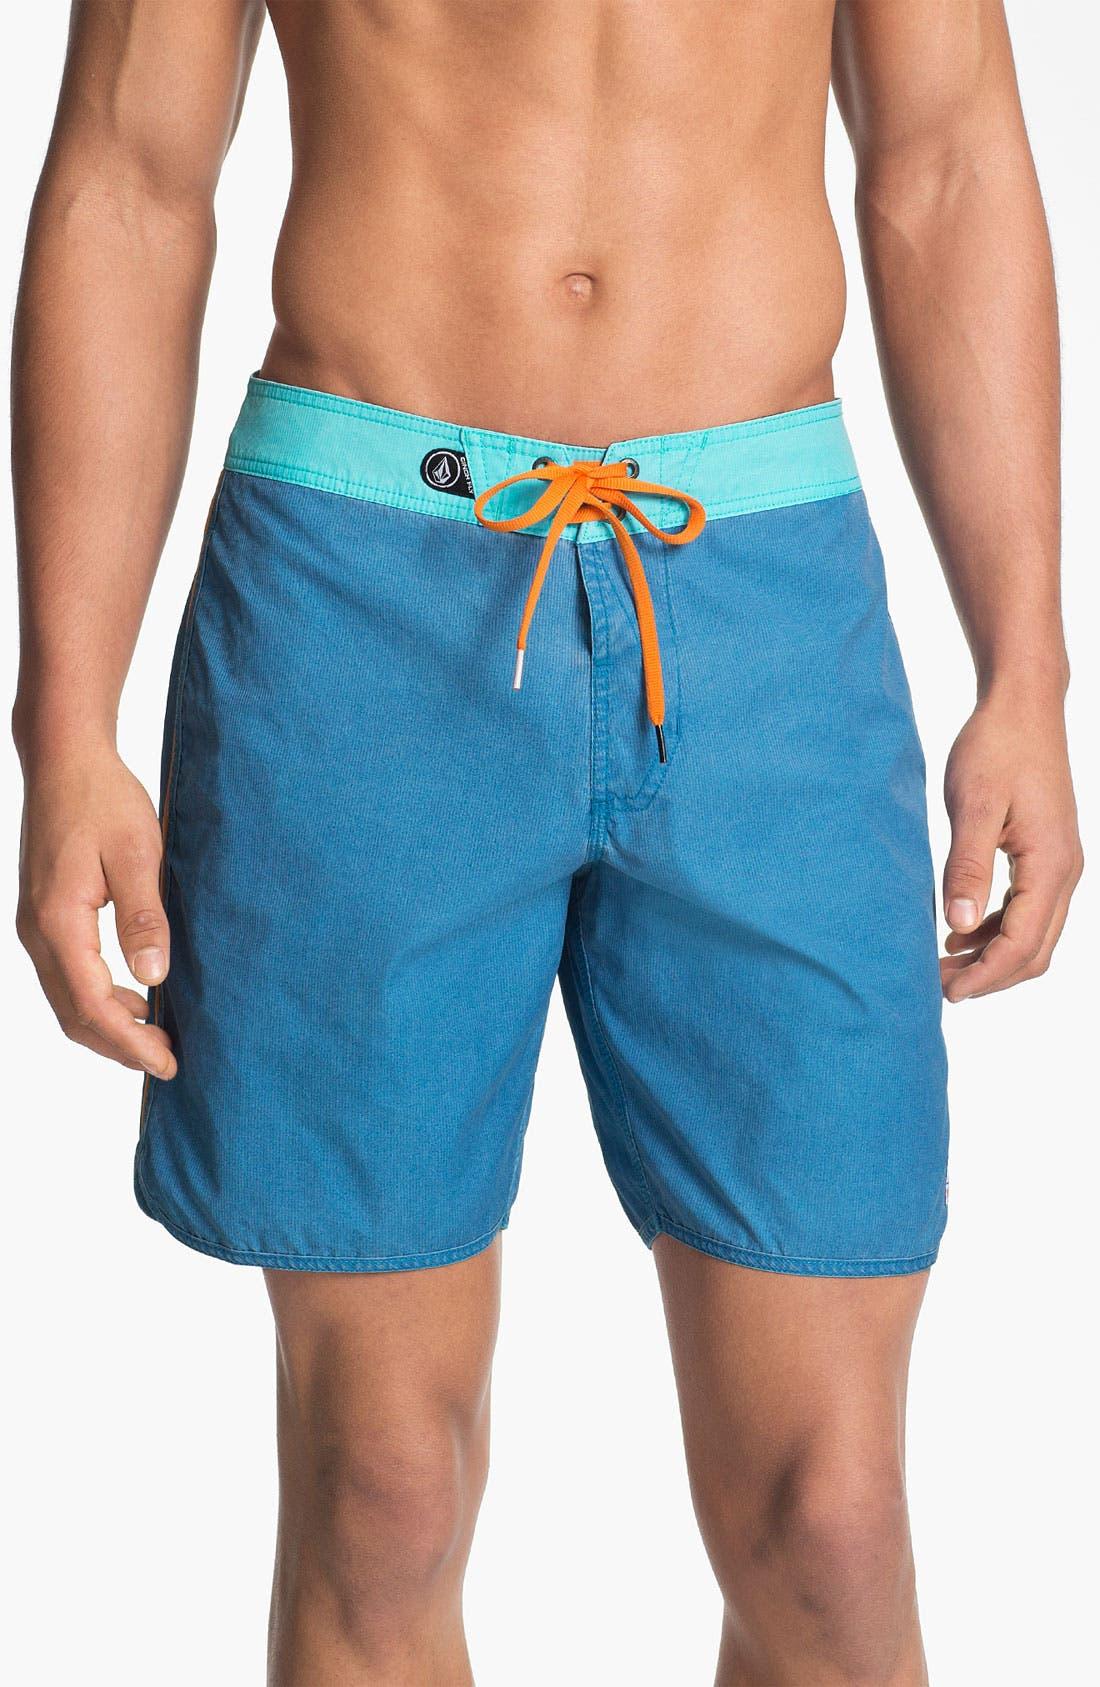 Alternate Image 1 Selected - Volcom 'Beach Road 18' Board Shorts